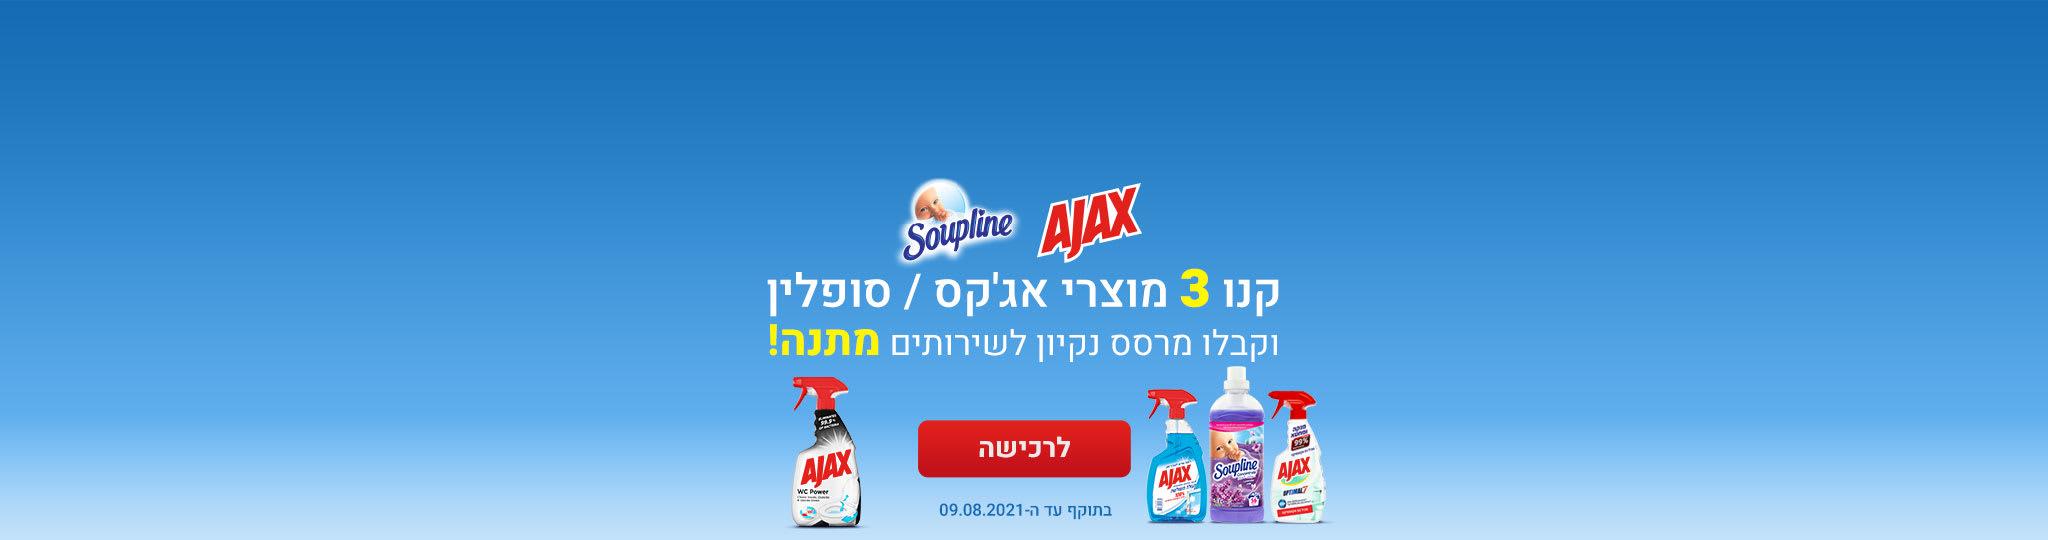 SOUPLINE AJAX   קנו 3 מוצרי אג'קס/סופלין וקבלו מרסס ניקיון לשירותים מתנה! לרכישה בתוקף עד ה-09.08.21